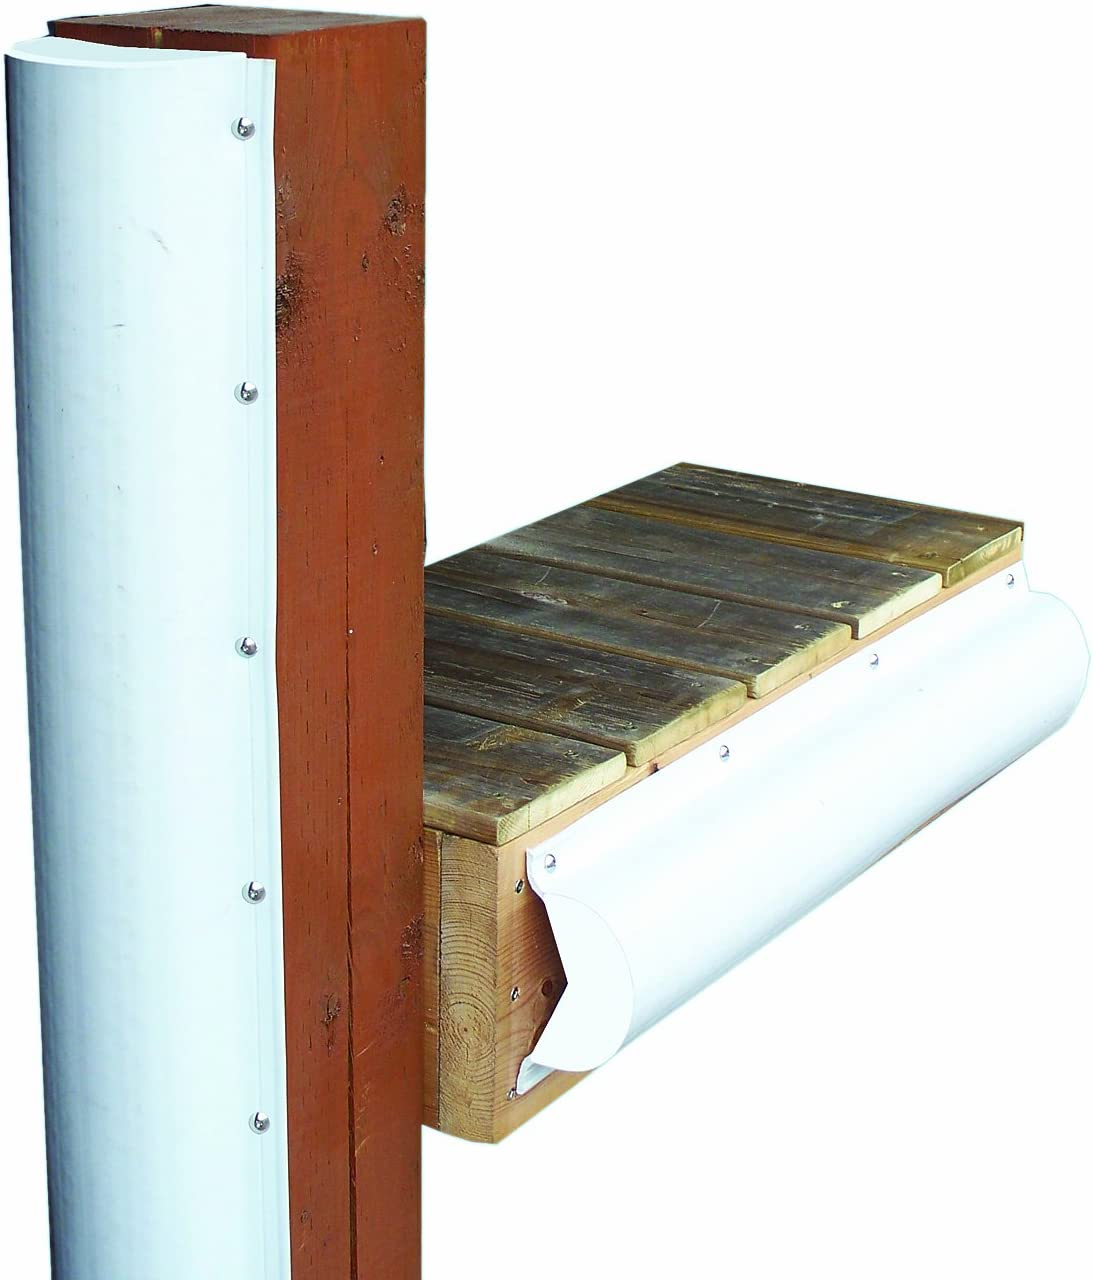 B000EY16JG Dock Edge + Inc. Premium PVC Dock Bumper Corner Edge Profile 71OwNjFETDL